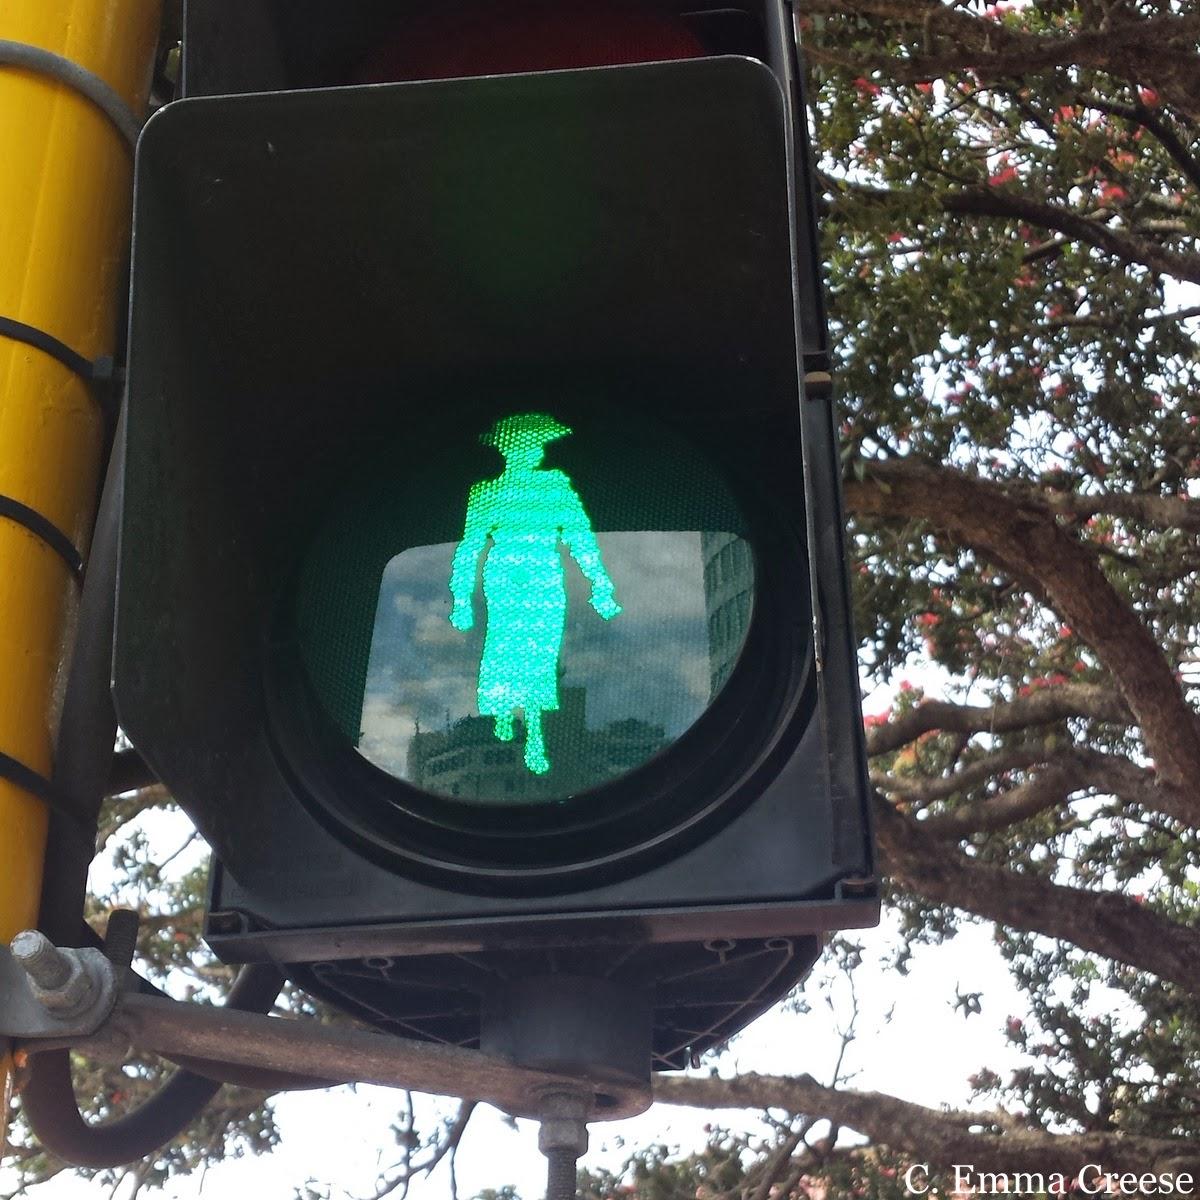 Cuba Street, Wellington New Zealand - The siren call of home to a longterm expat